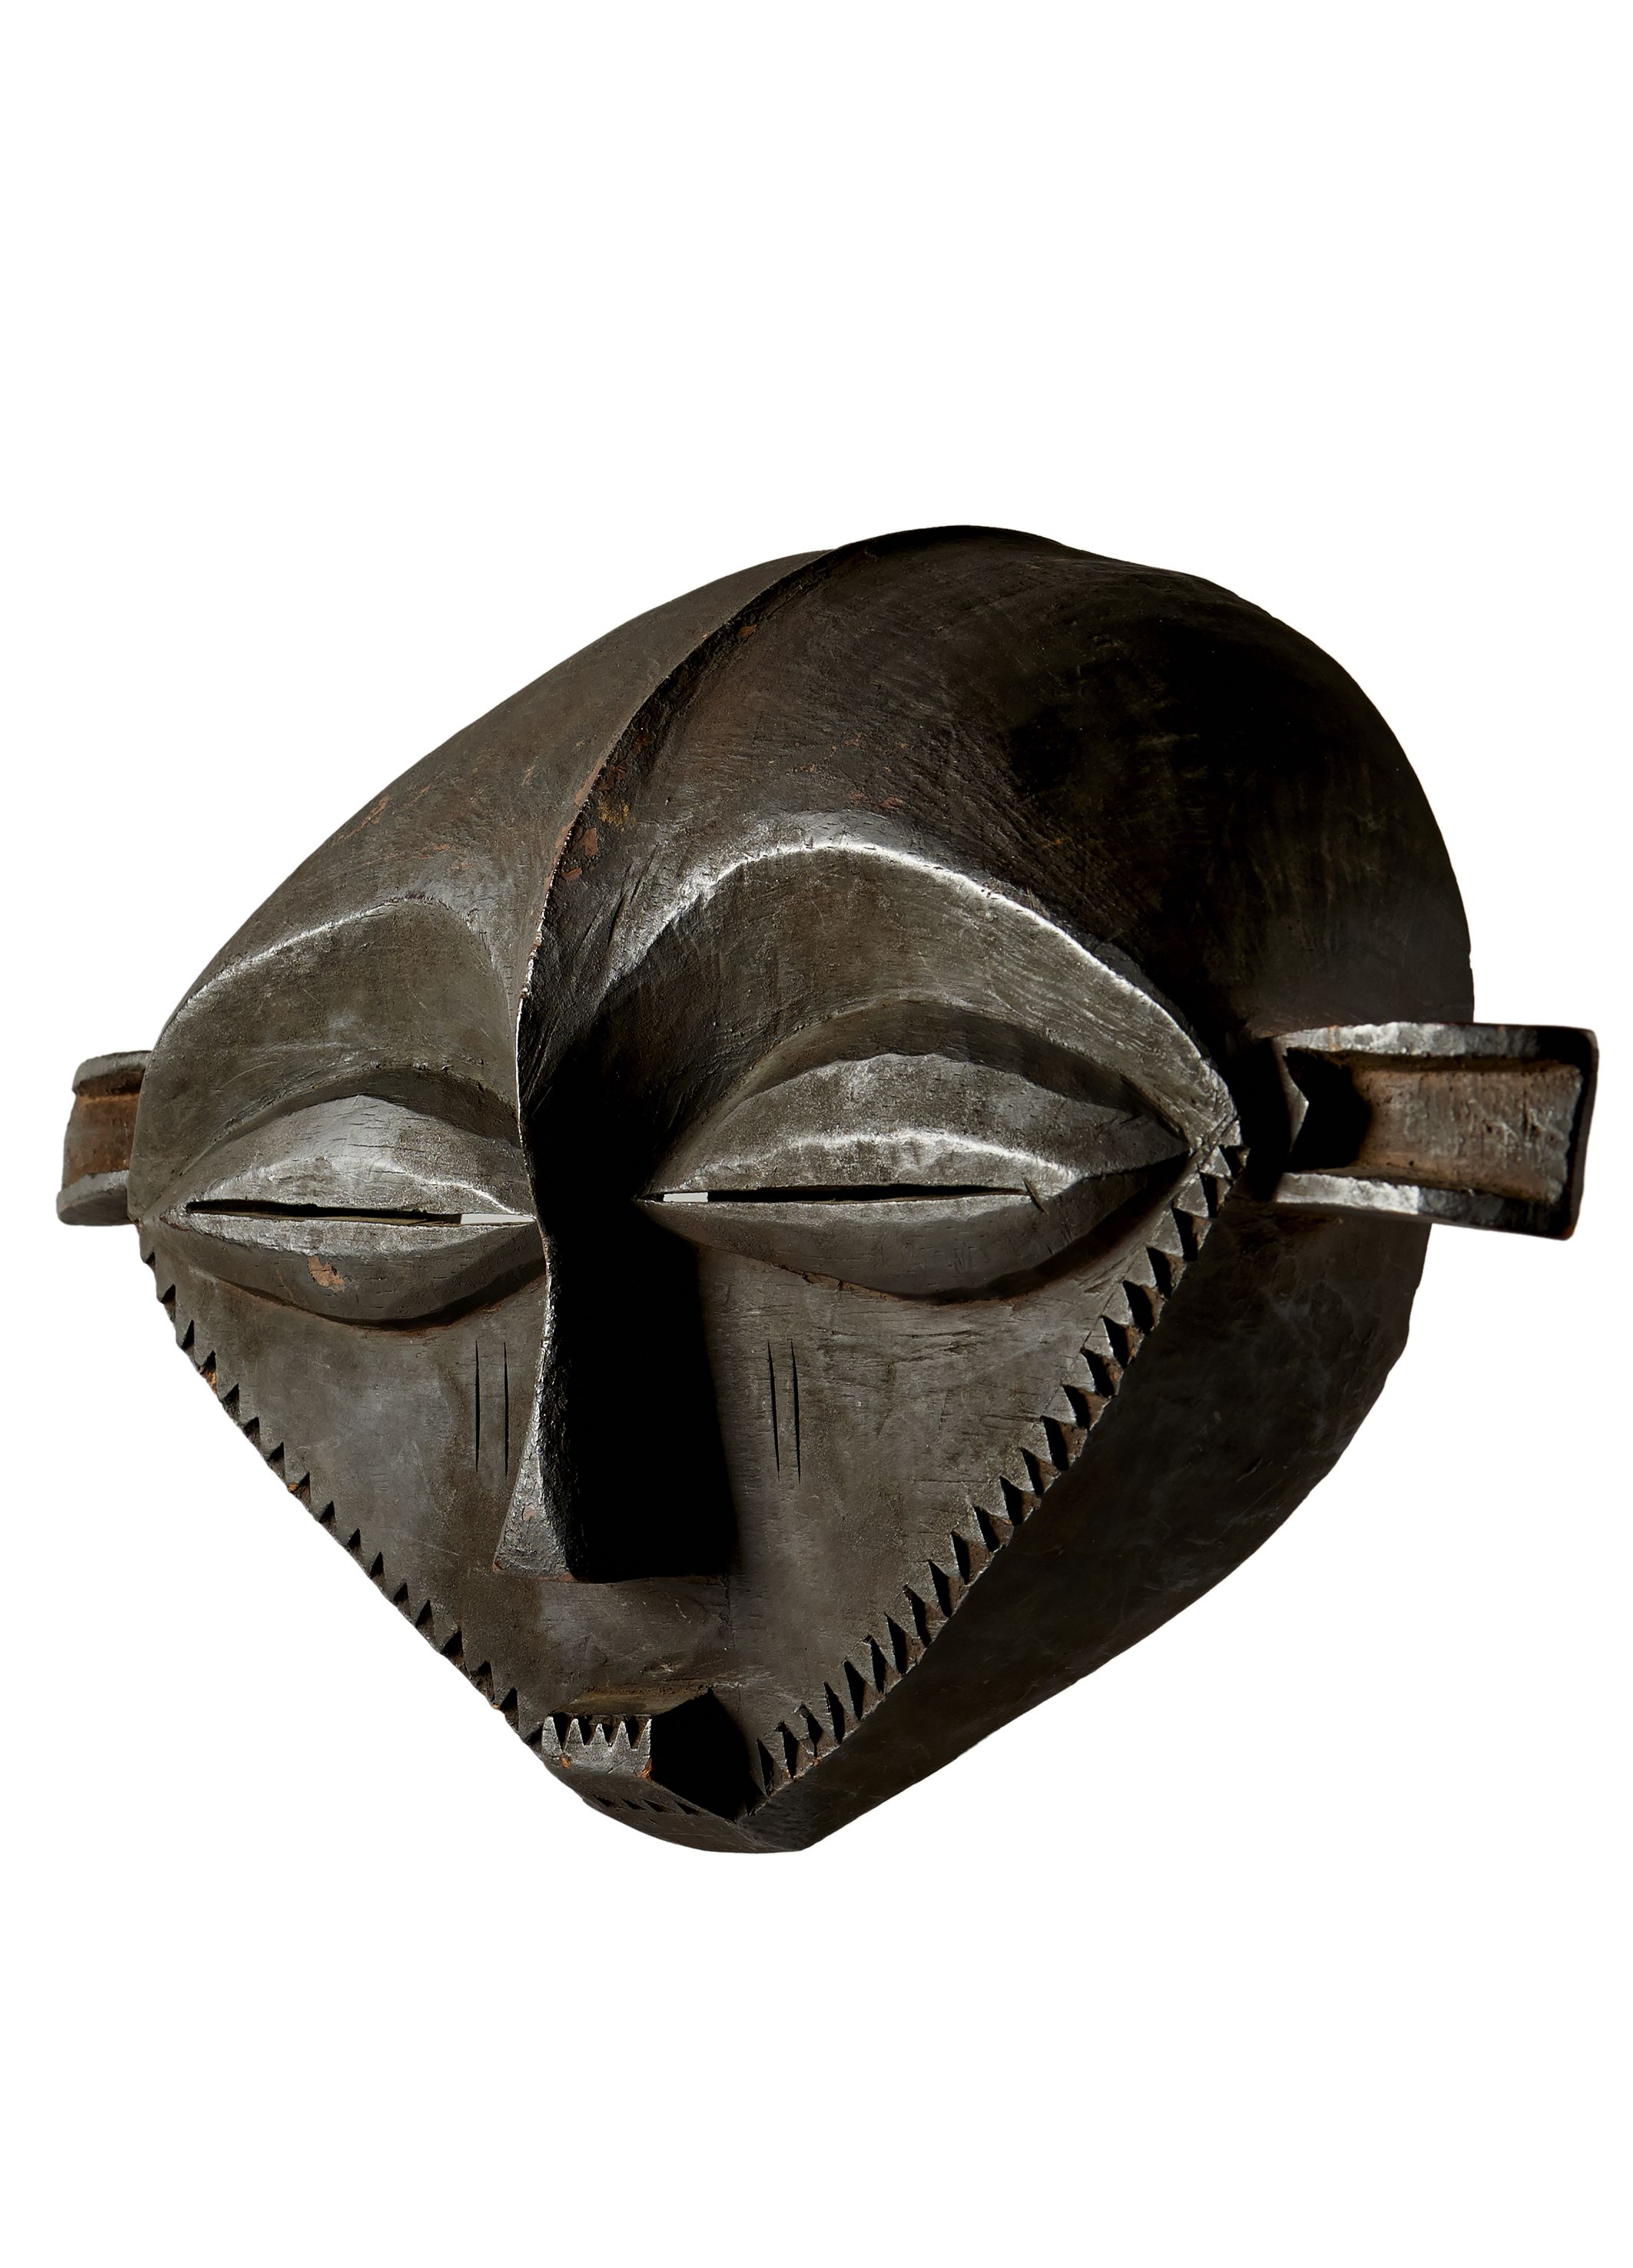 Native - A Pende mask